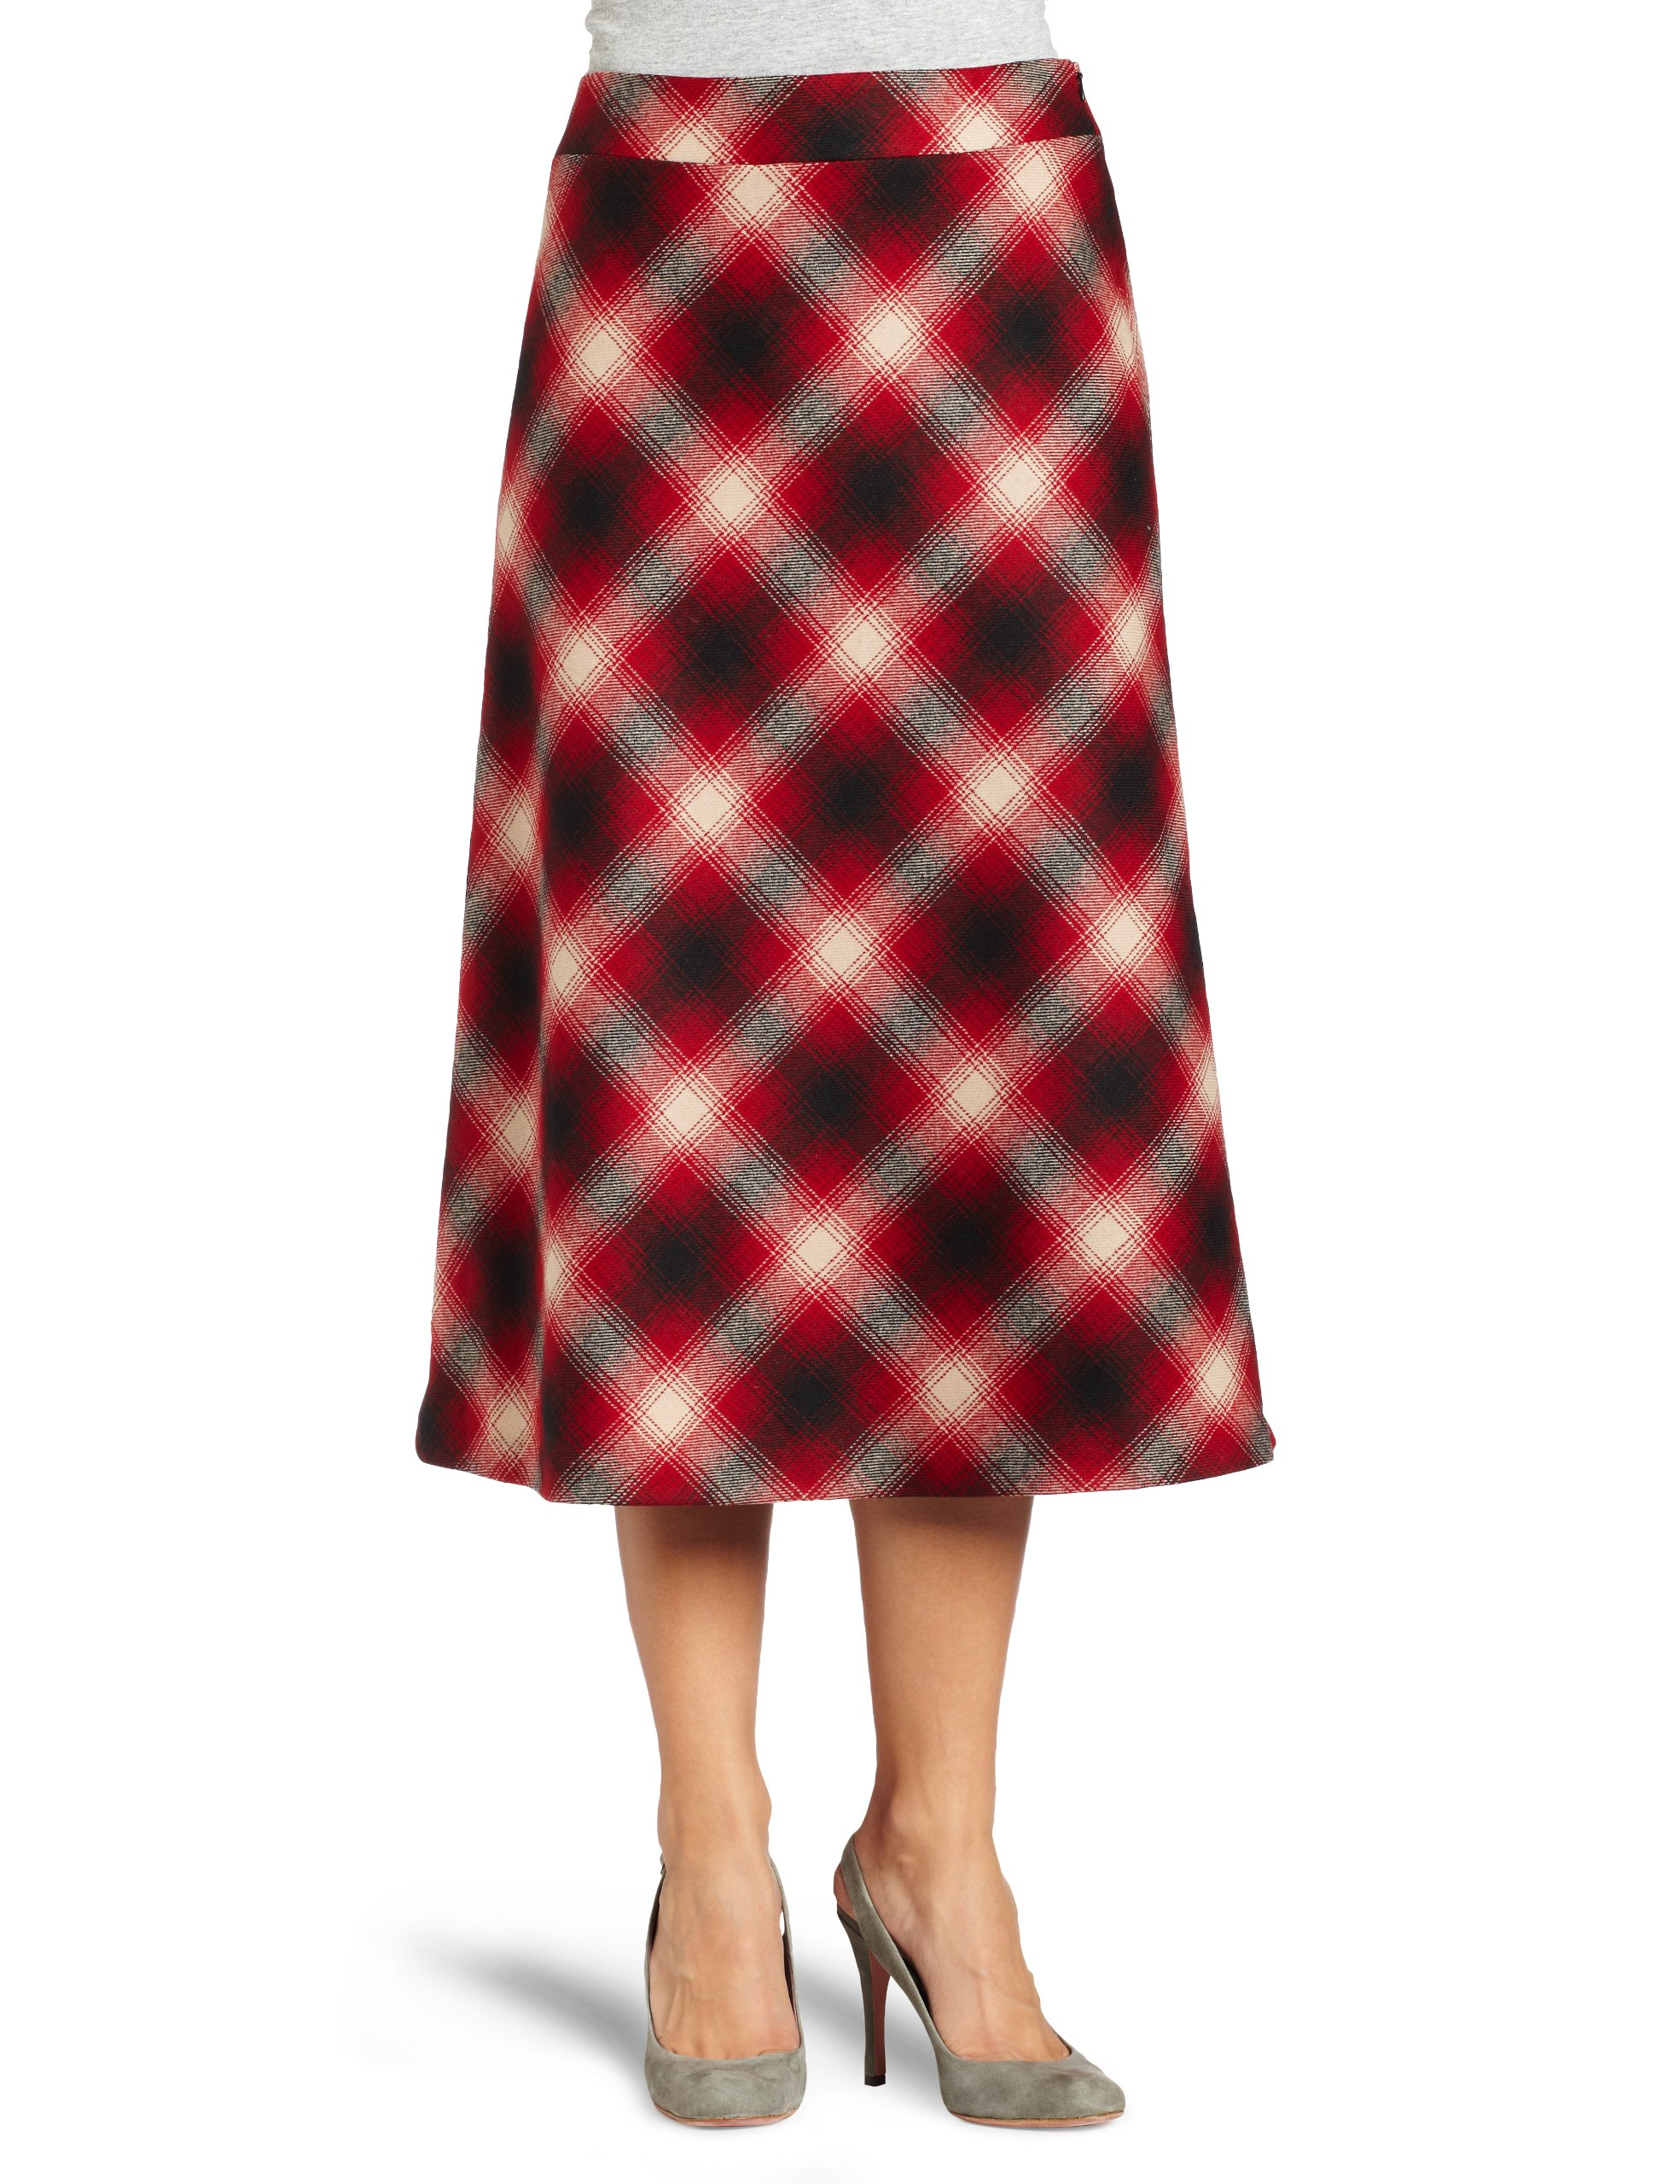 Pendleton Women's Bias Plaid Skirt, Black/Red Ombre Plaid, 14